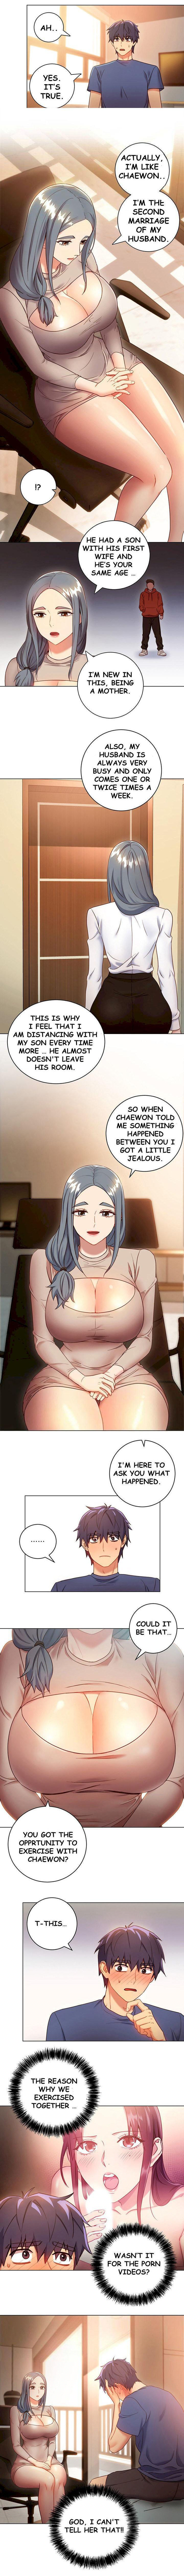 [Neck Pilllow] Stepmother Friends Ch.39/? [English] [Hentai Universe] NEW! 13/10/2020 194